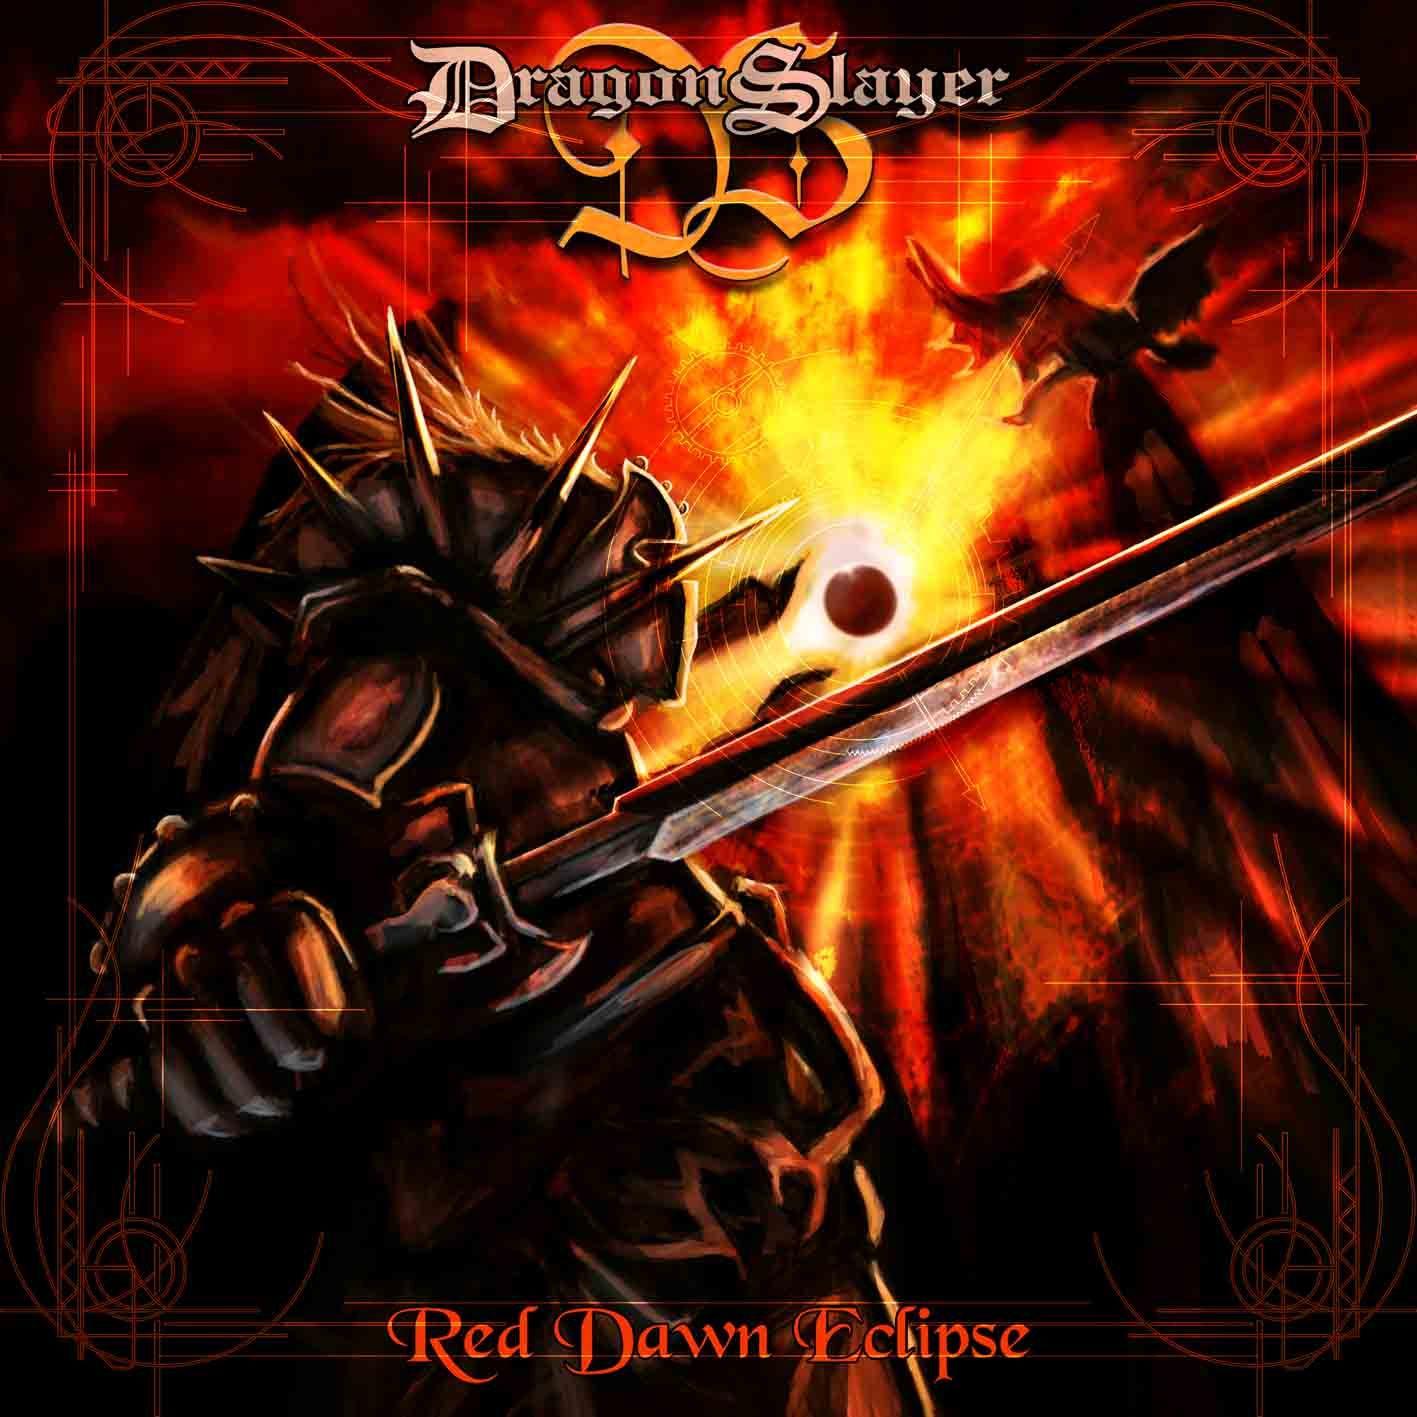 DragonSlayer - Red Dawn Eclipse (Demo, 2005)